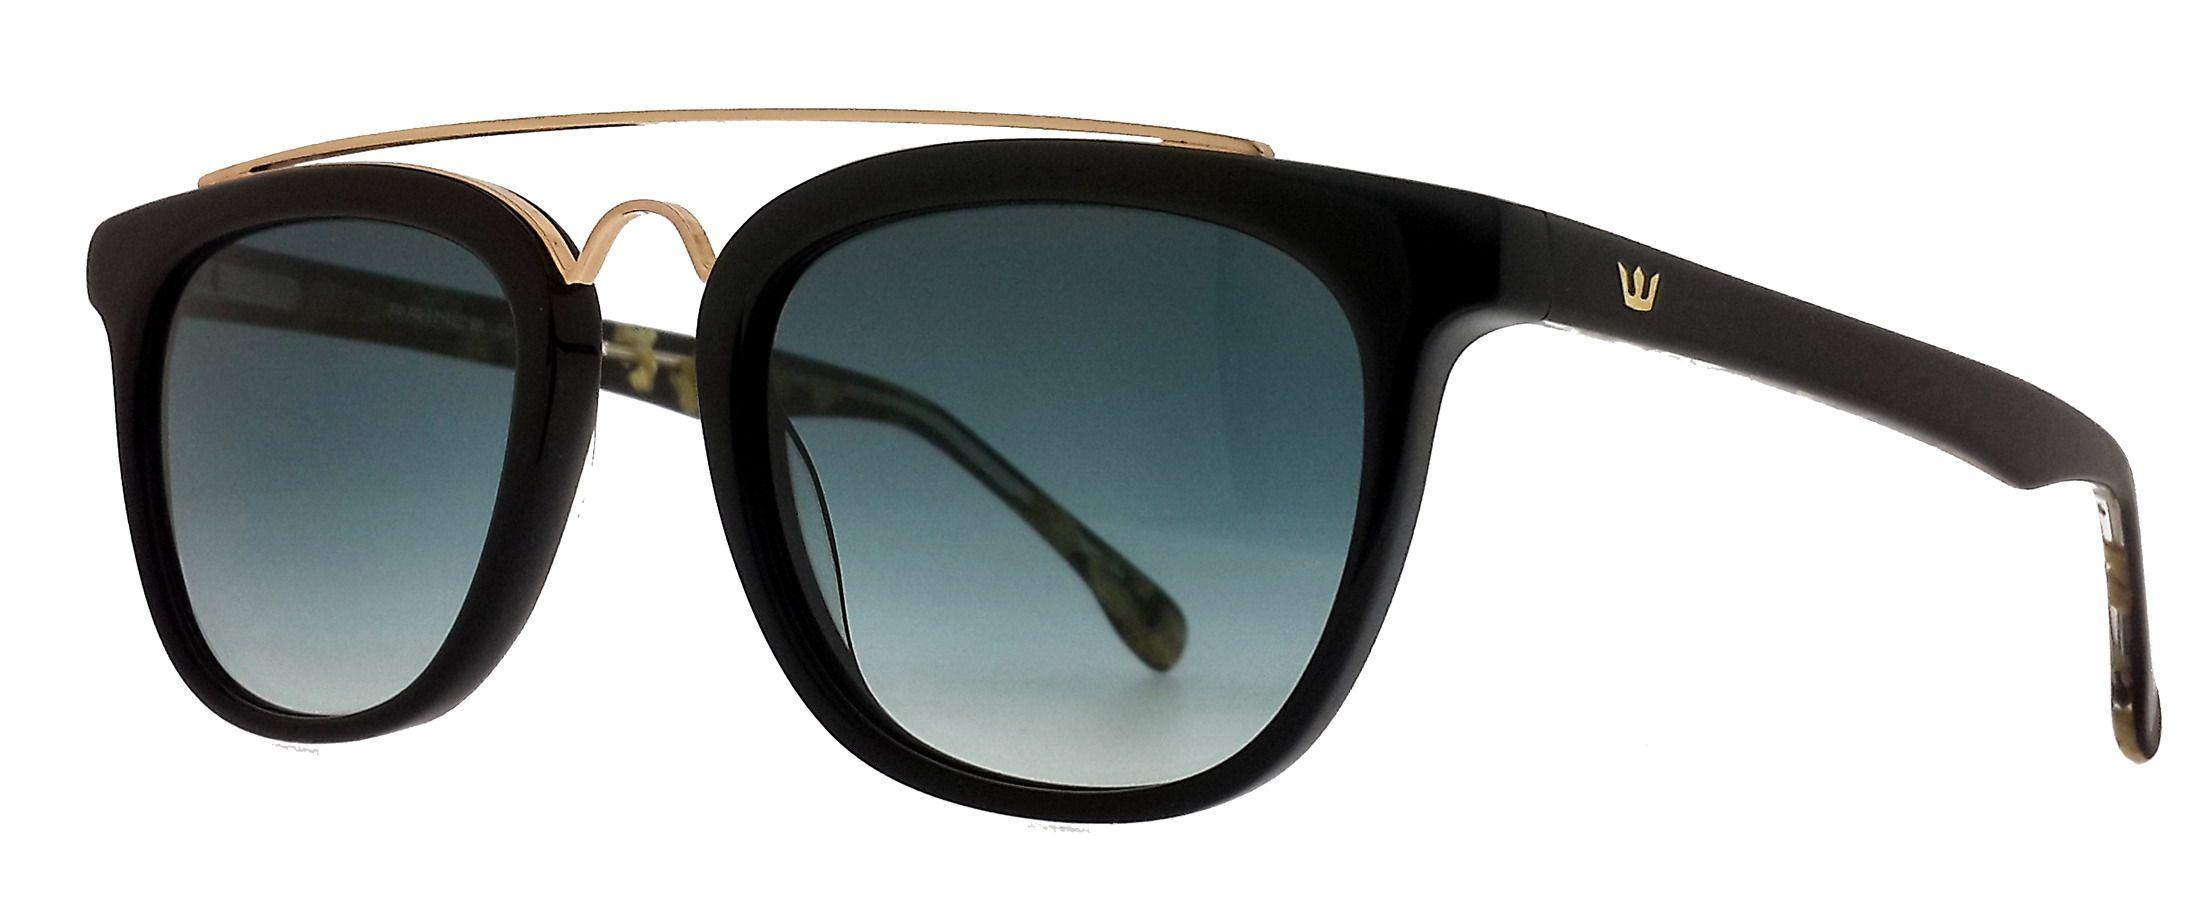 164b3cf8e5 PRINCE EYEWEAR women s sunglasses! (model 74-525 col.01) visit  http   www.prince-concept.com